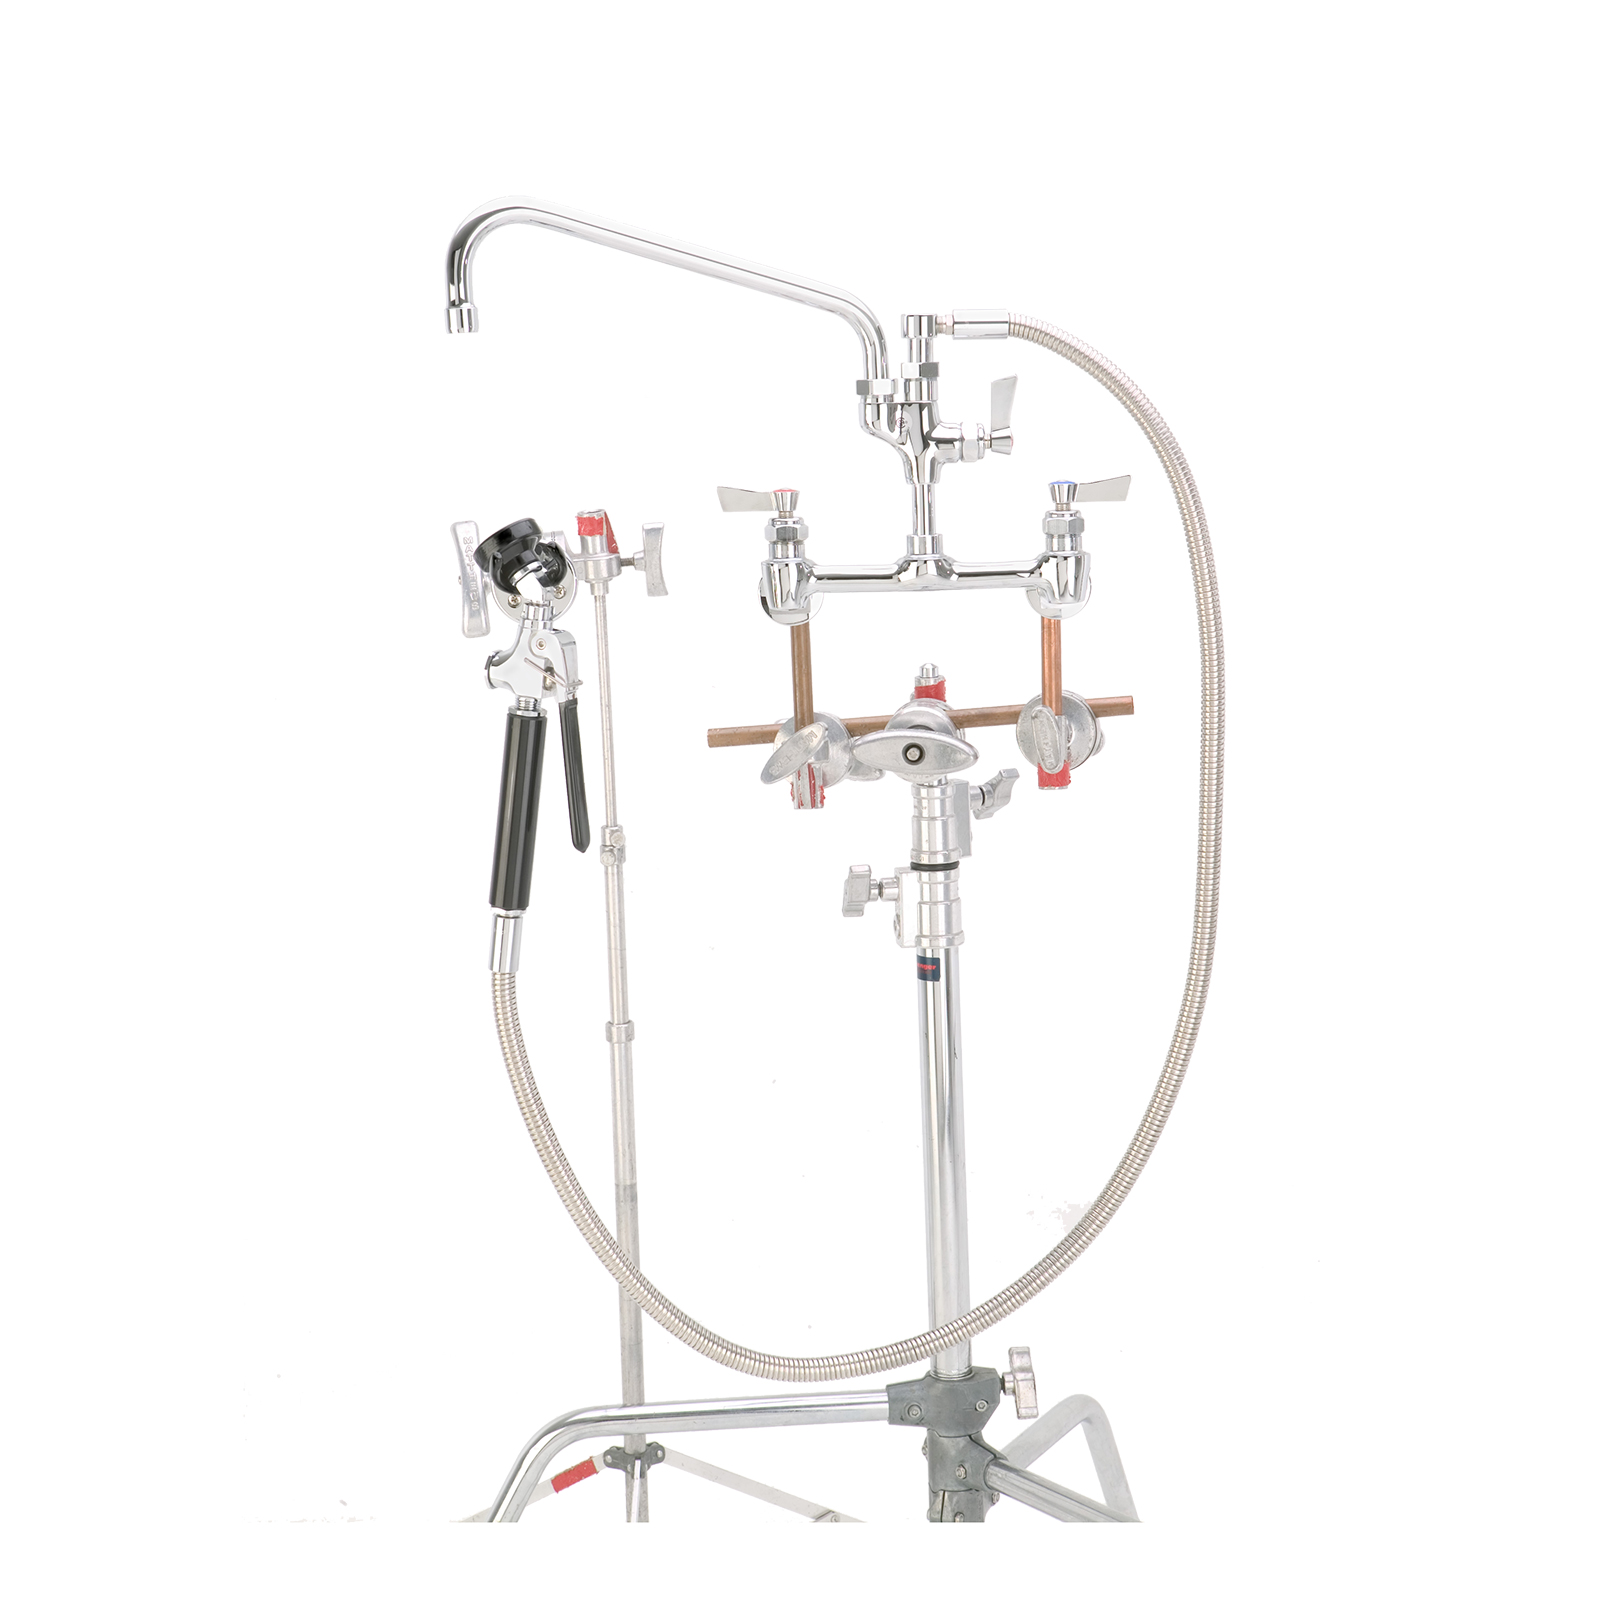 Fisher 84026 faucet, kettle / pot filler